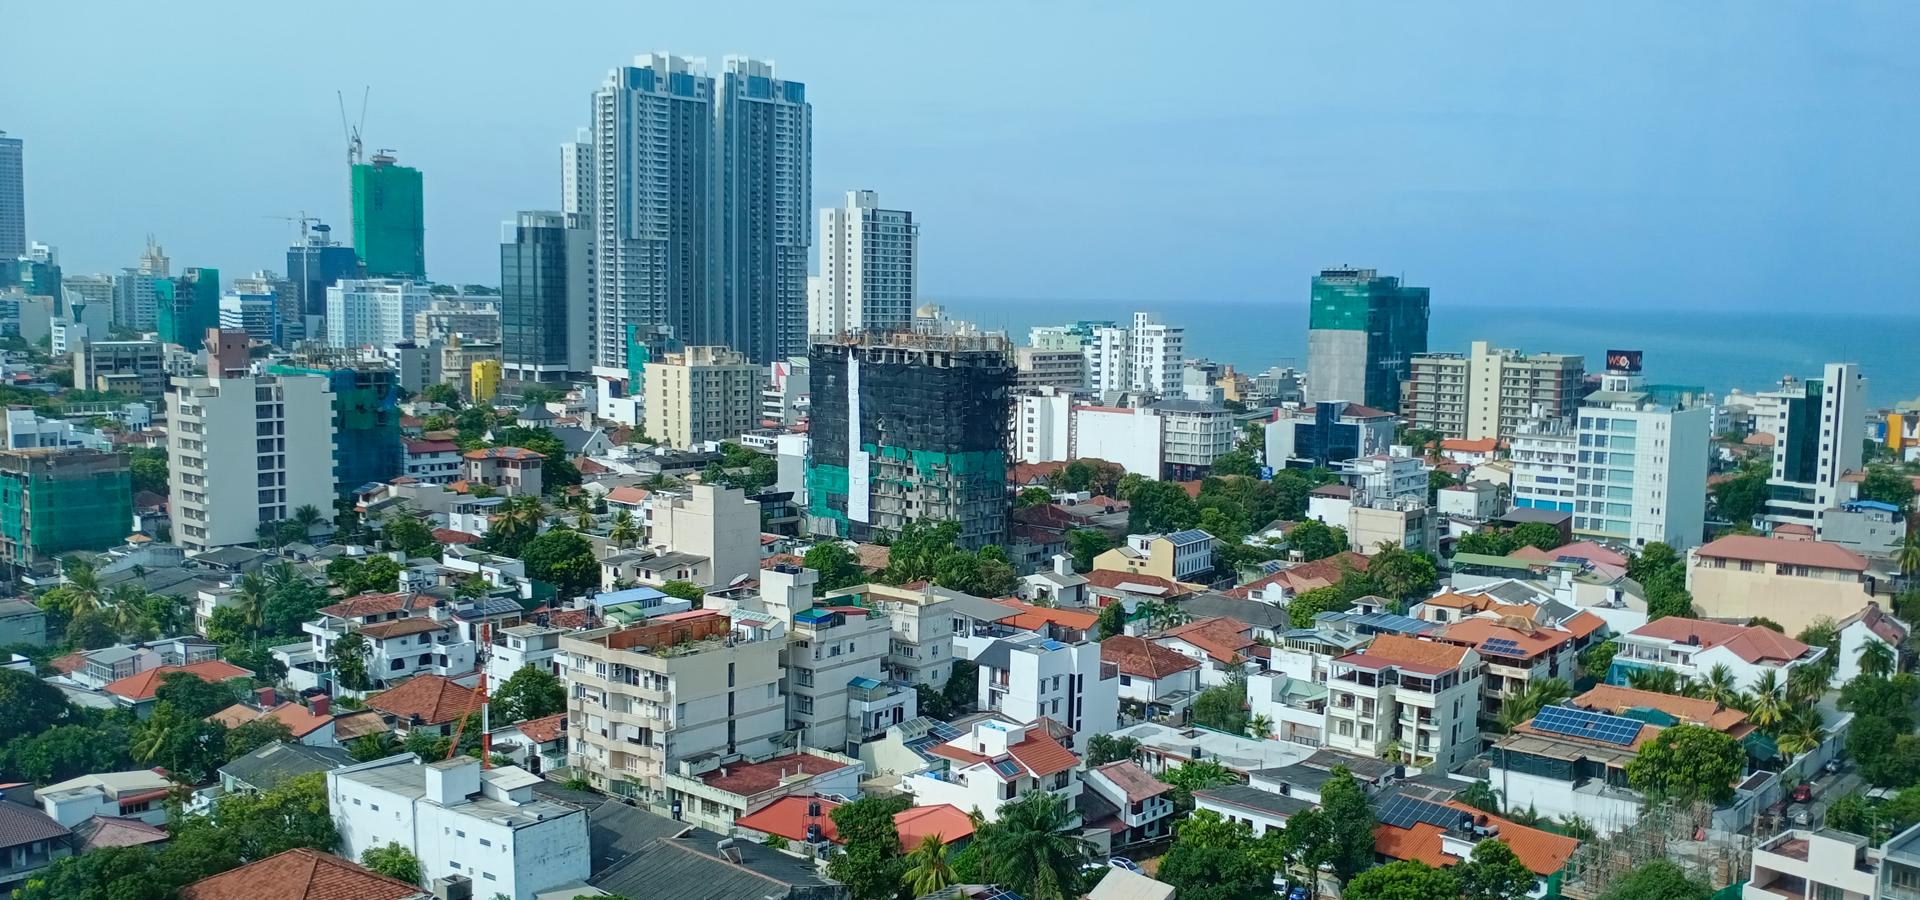 Peer-to-peer advisory in Colombo, Colombo District, Sri Lanka